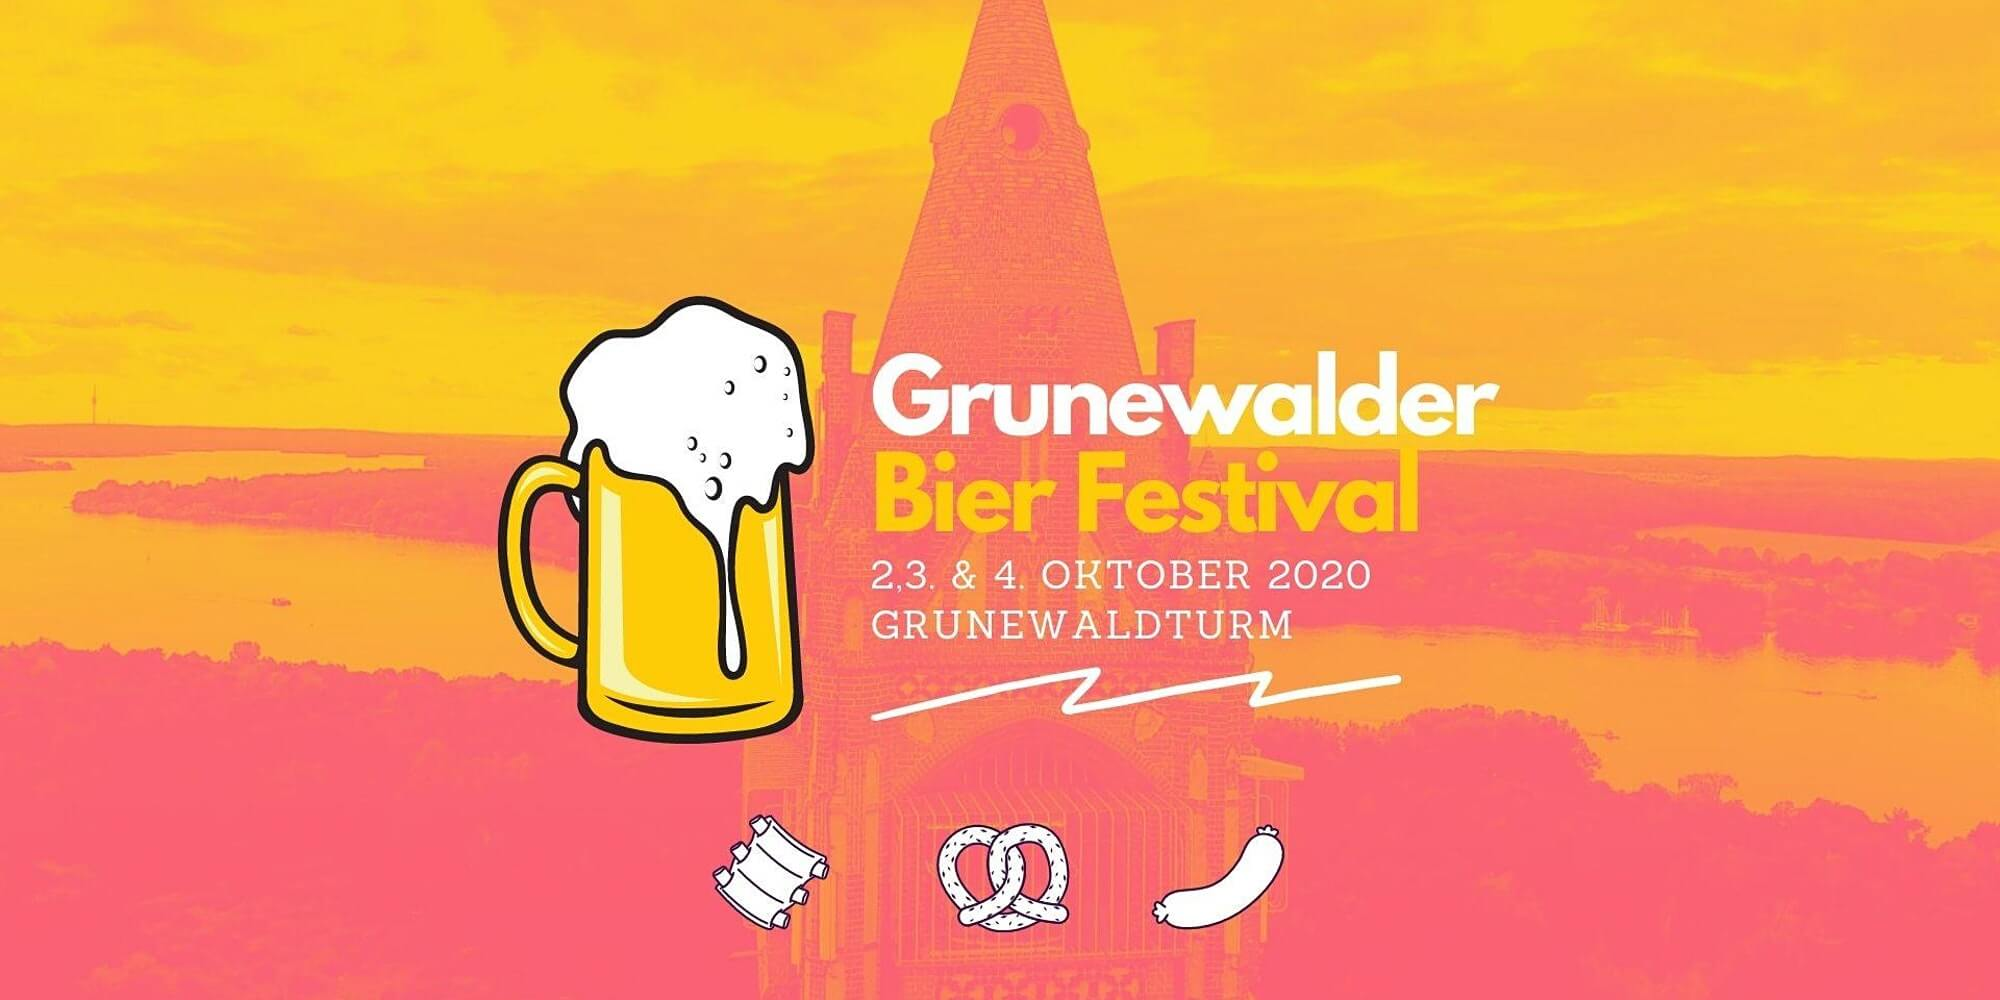 Grunewalder Bier Festival 2020